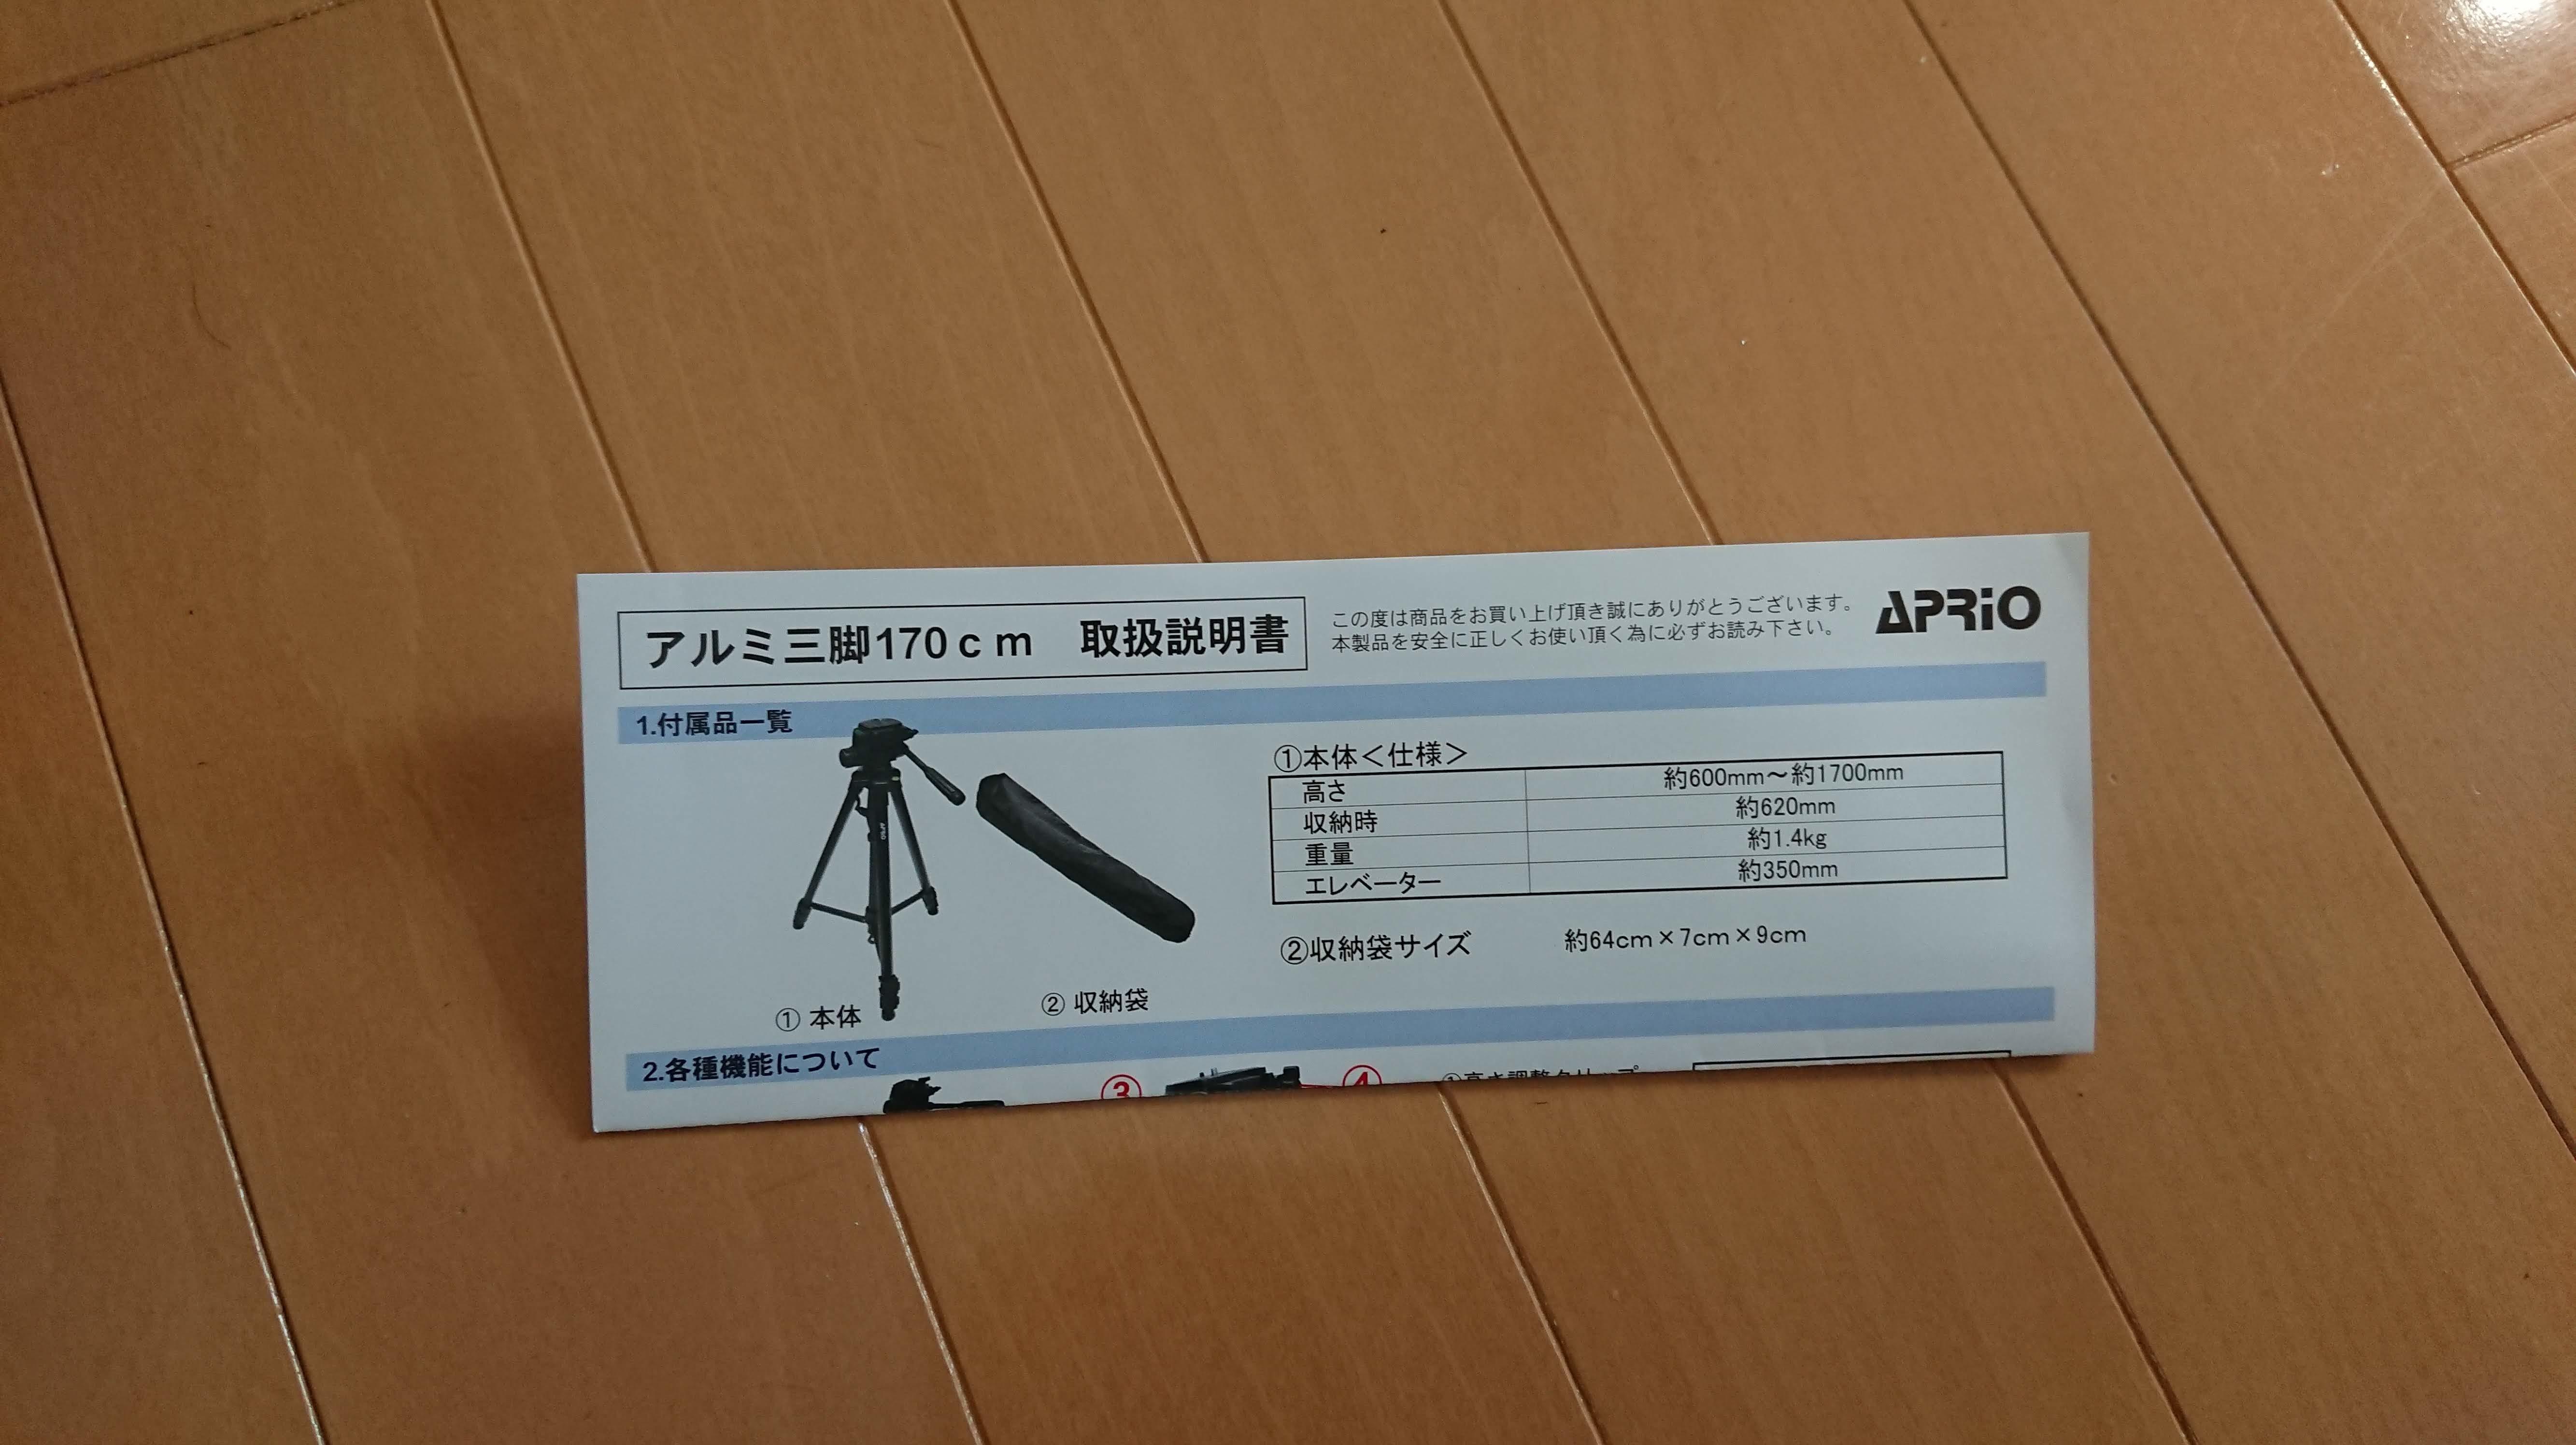 「APRIO LT-170」取扱説明書